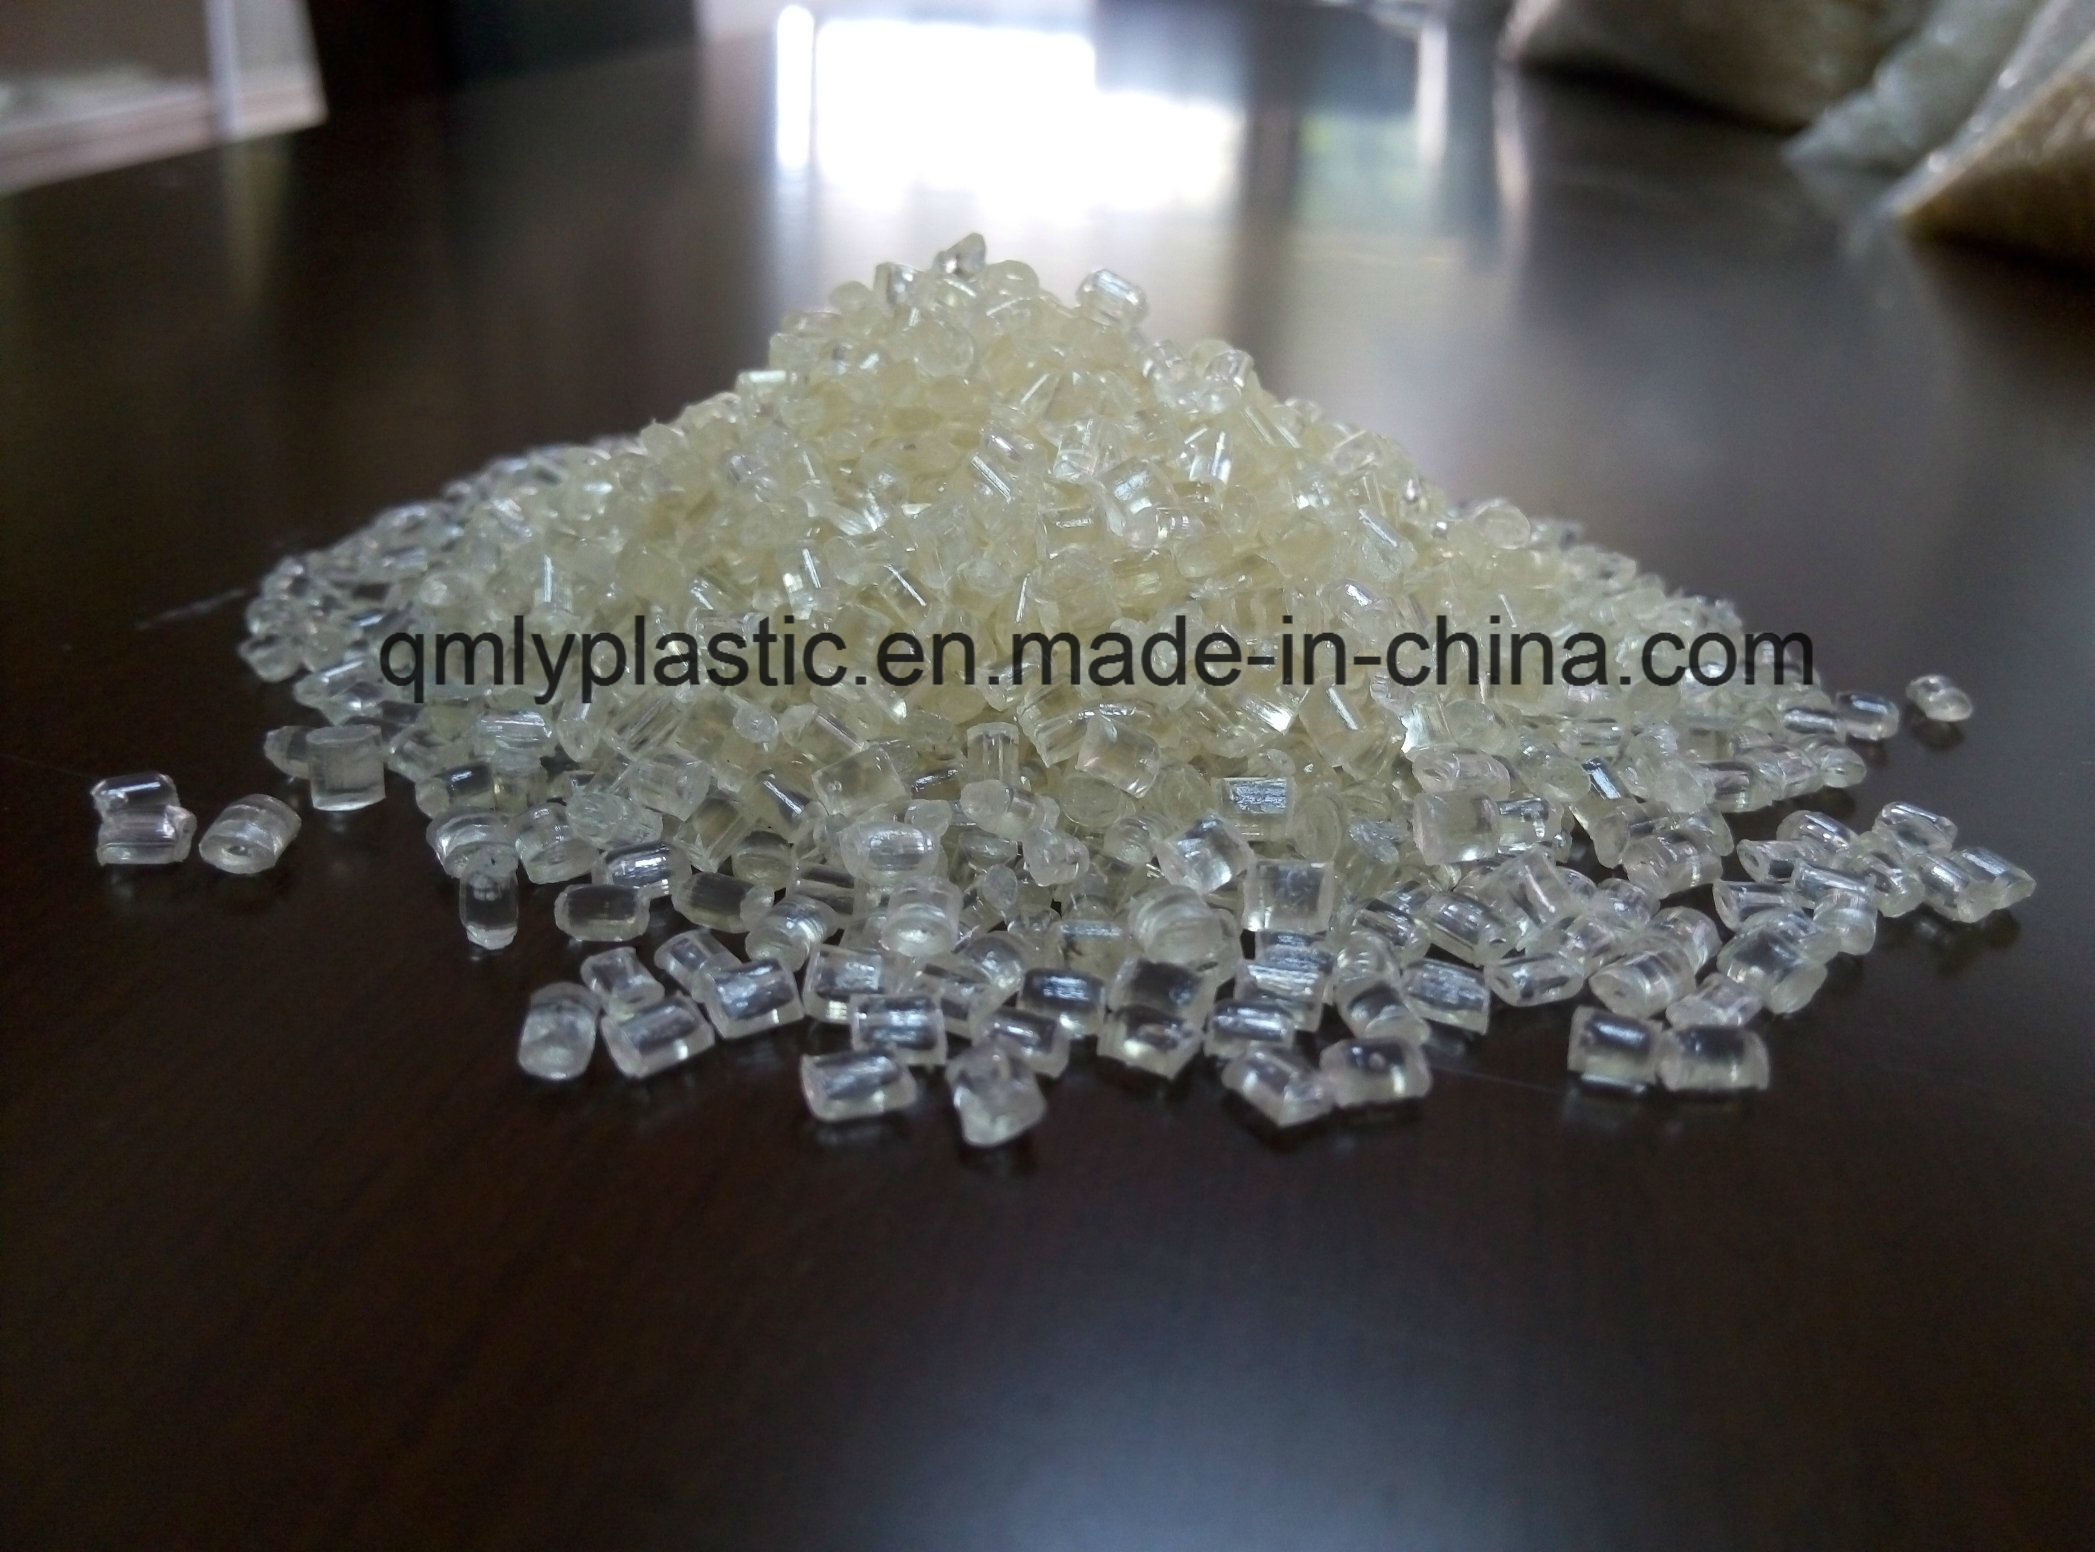 PSU/Polysulfone Udel Solvay Thermoplastic Granulas